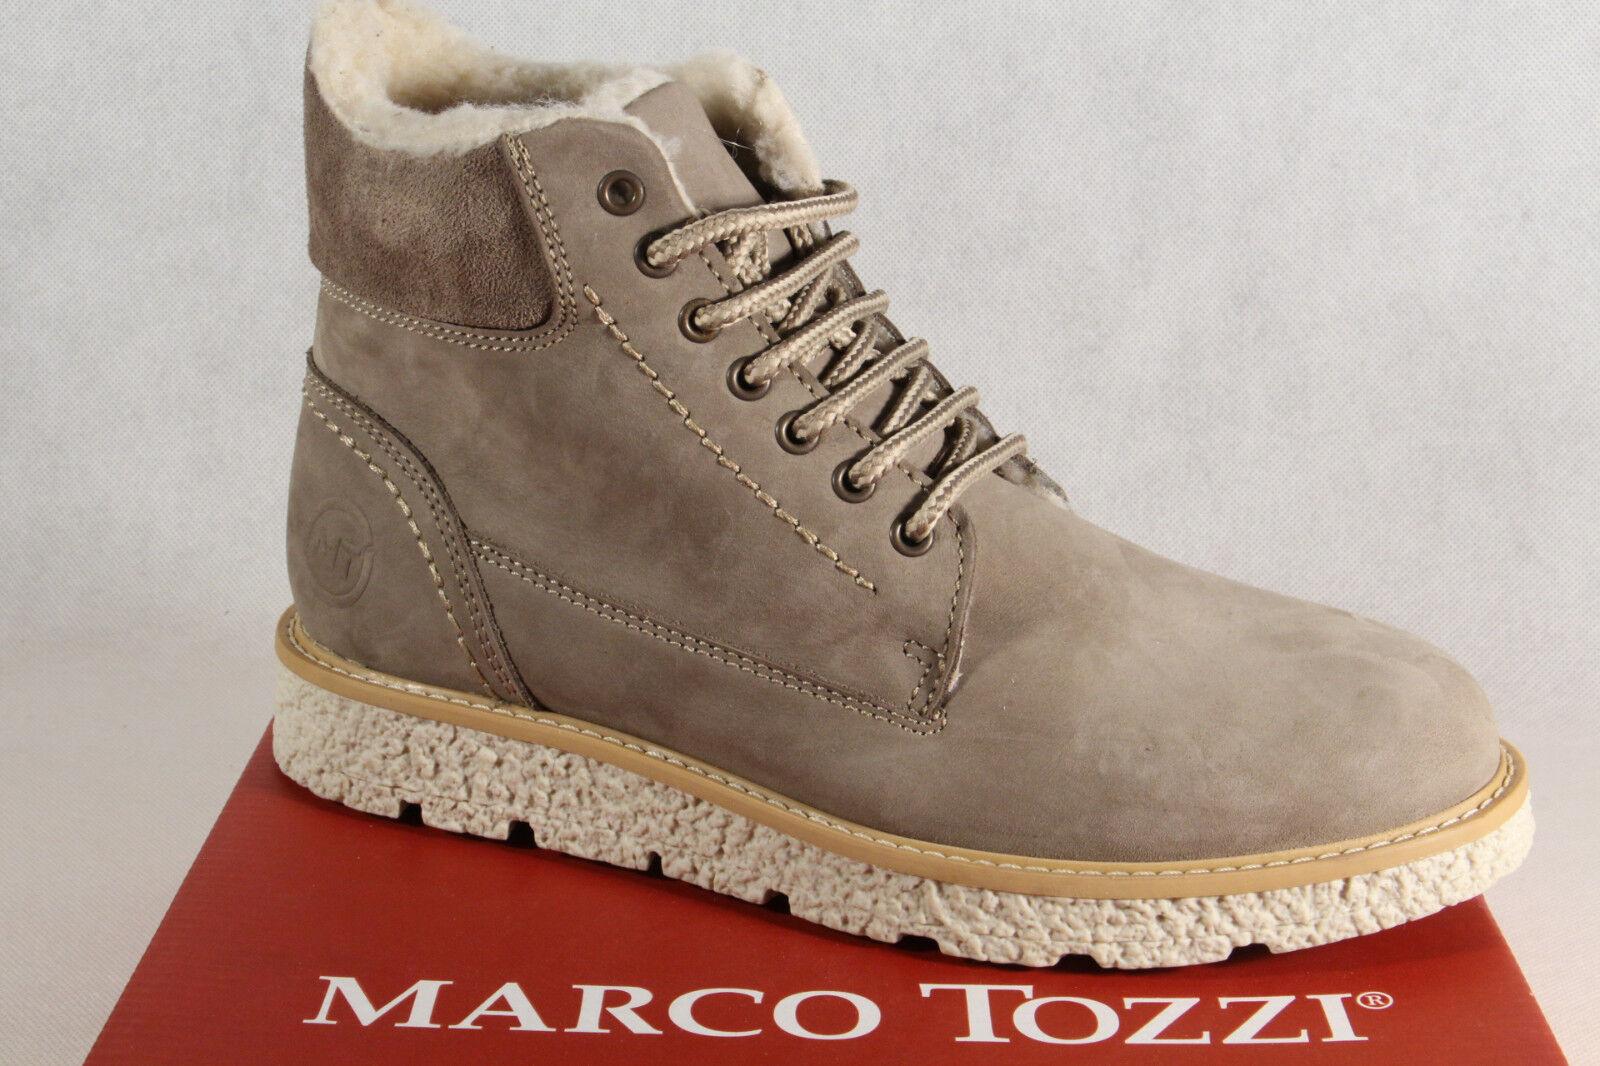 Marco Stiefeletten Tozzi Damen Stiefel 26255 Stiefeletten Marco Stiefel Schnürstiefel taupe NEU 022011